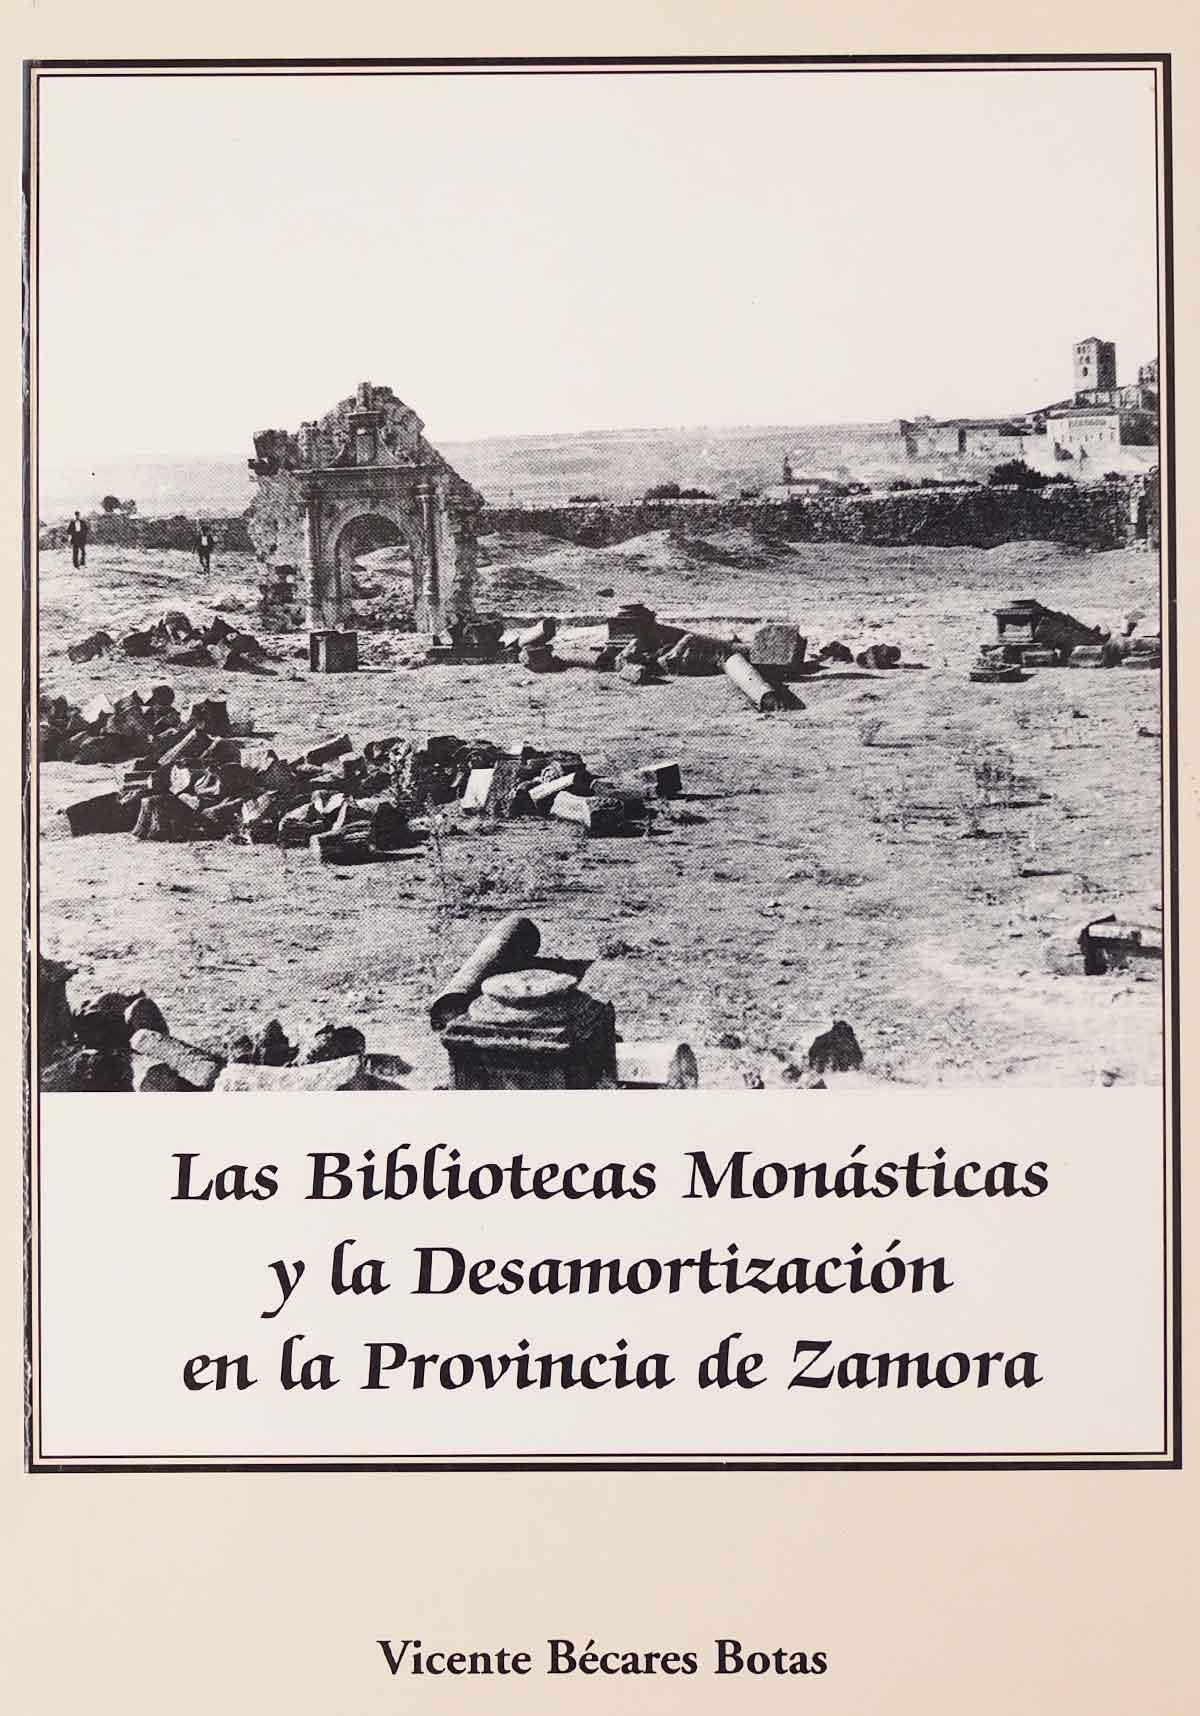 bibliotecas-monasticas-desamortizacion-vicente-becares-botas-editorial-semuret